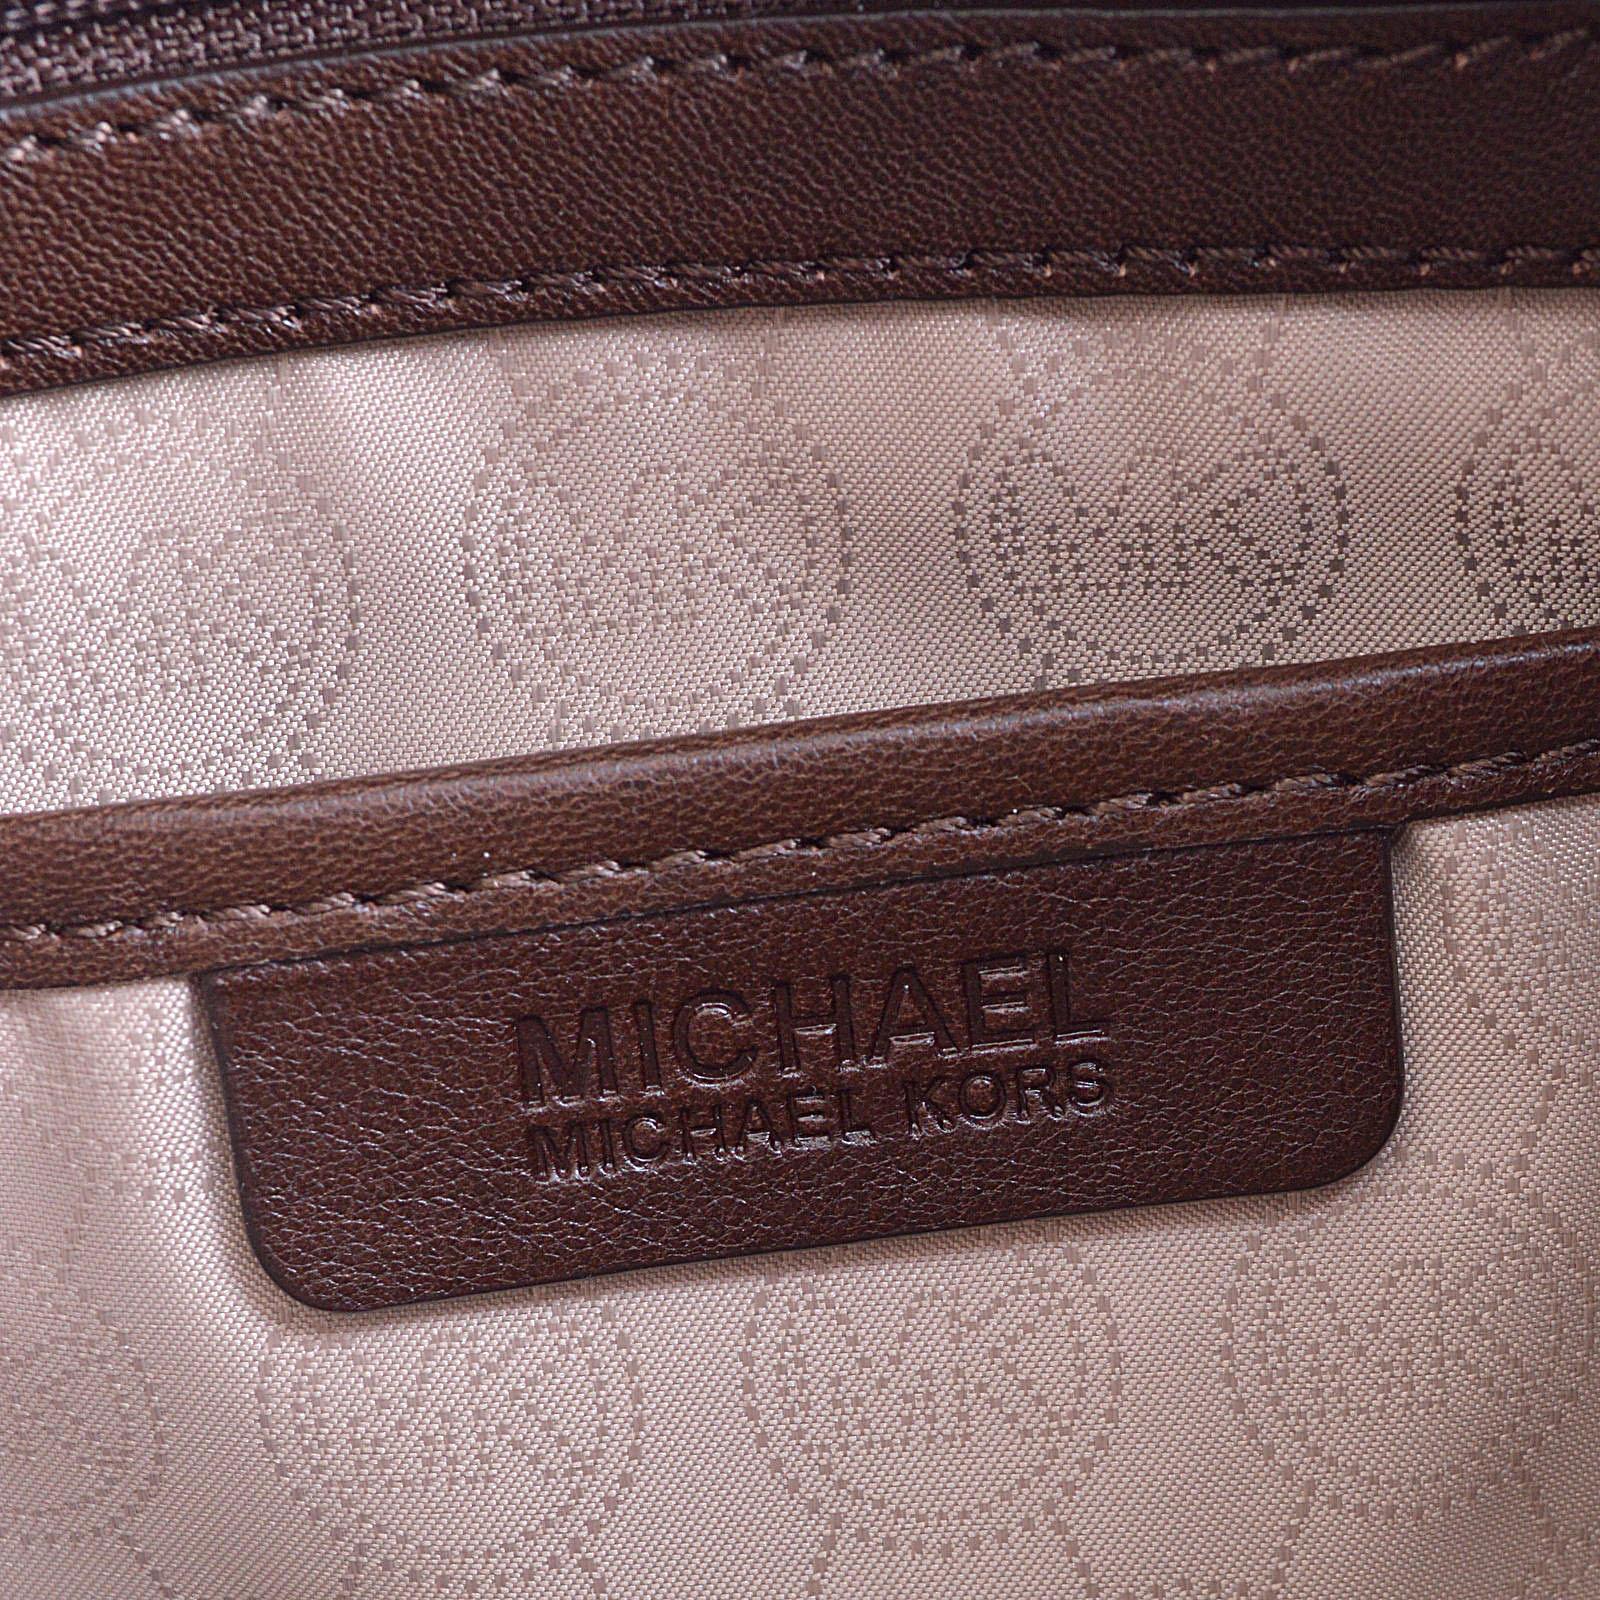 Used Michael Kors Handbags >> Buying Used Michael Kors Handbags Used Designer Handbags Blog